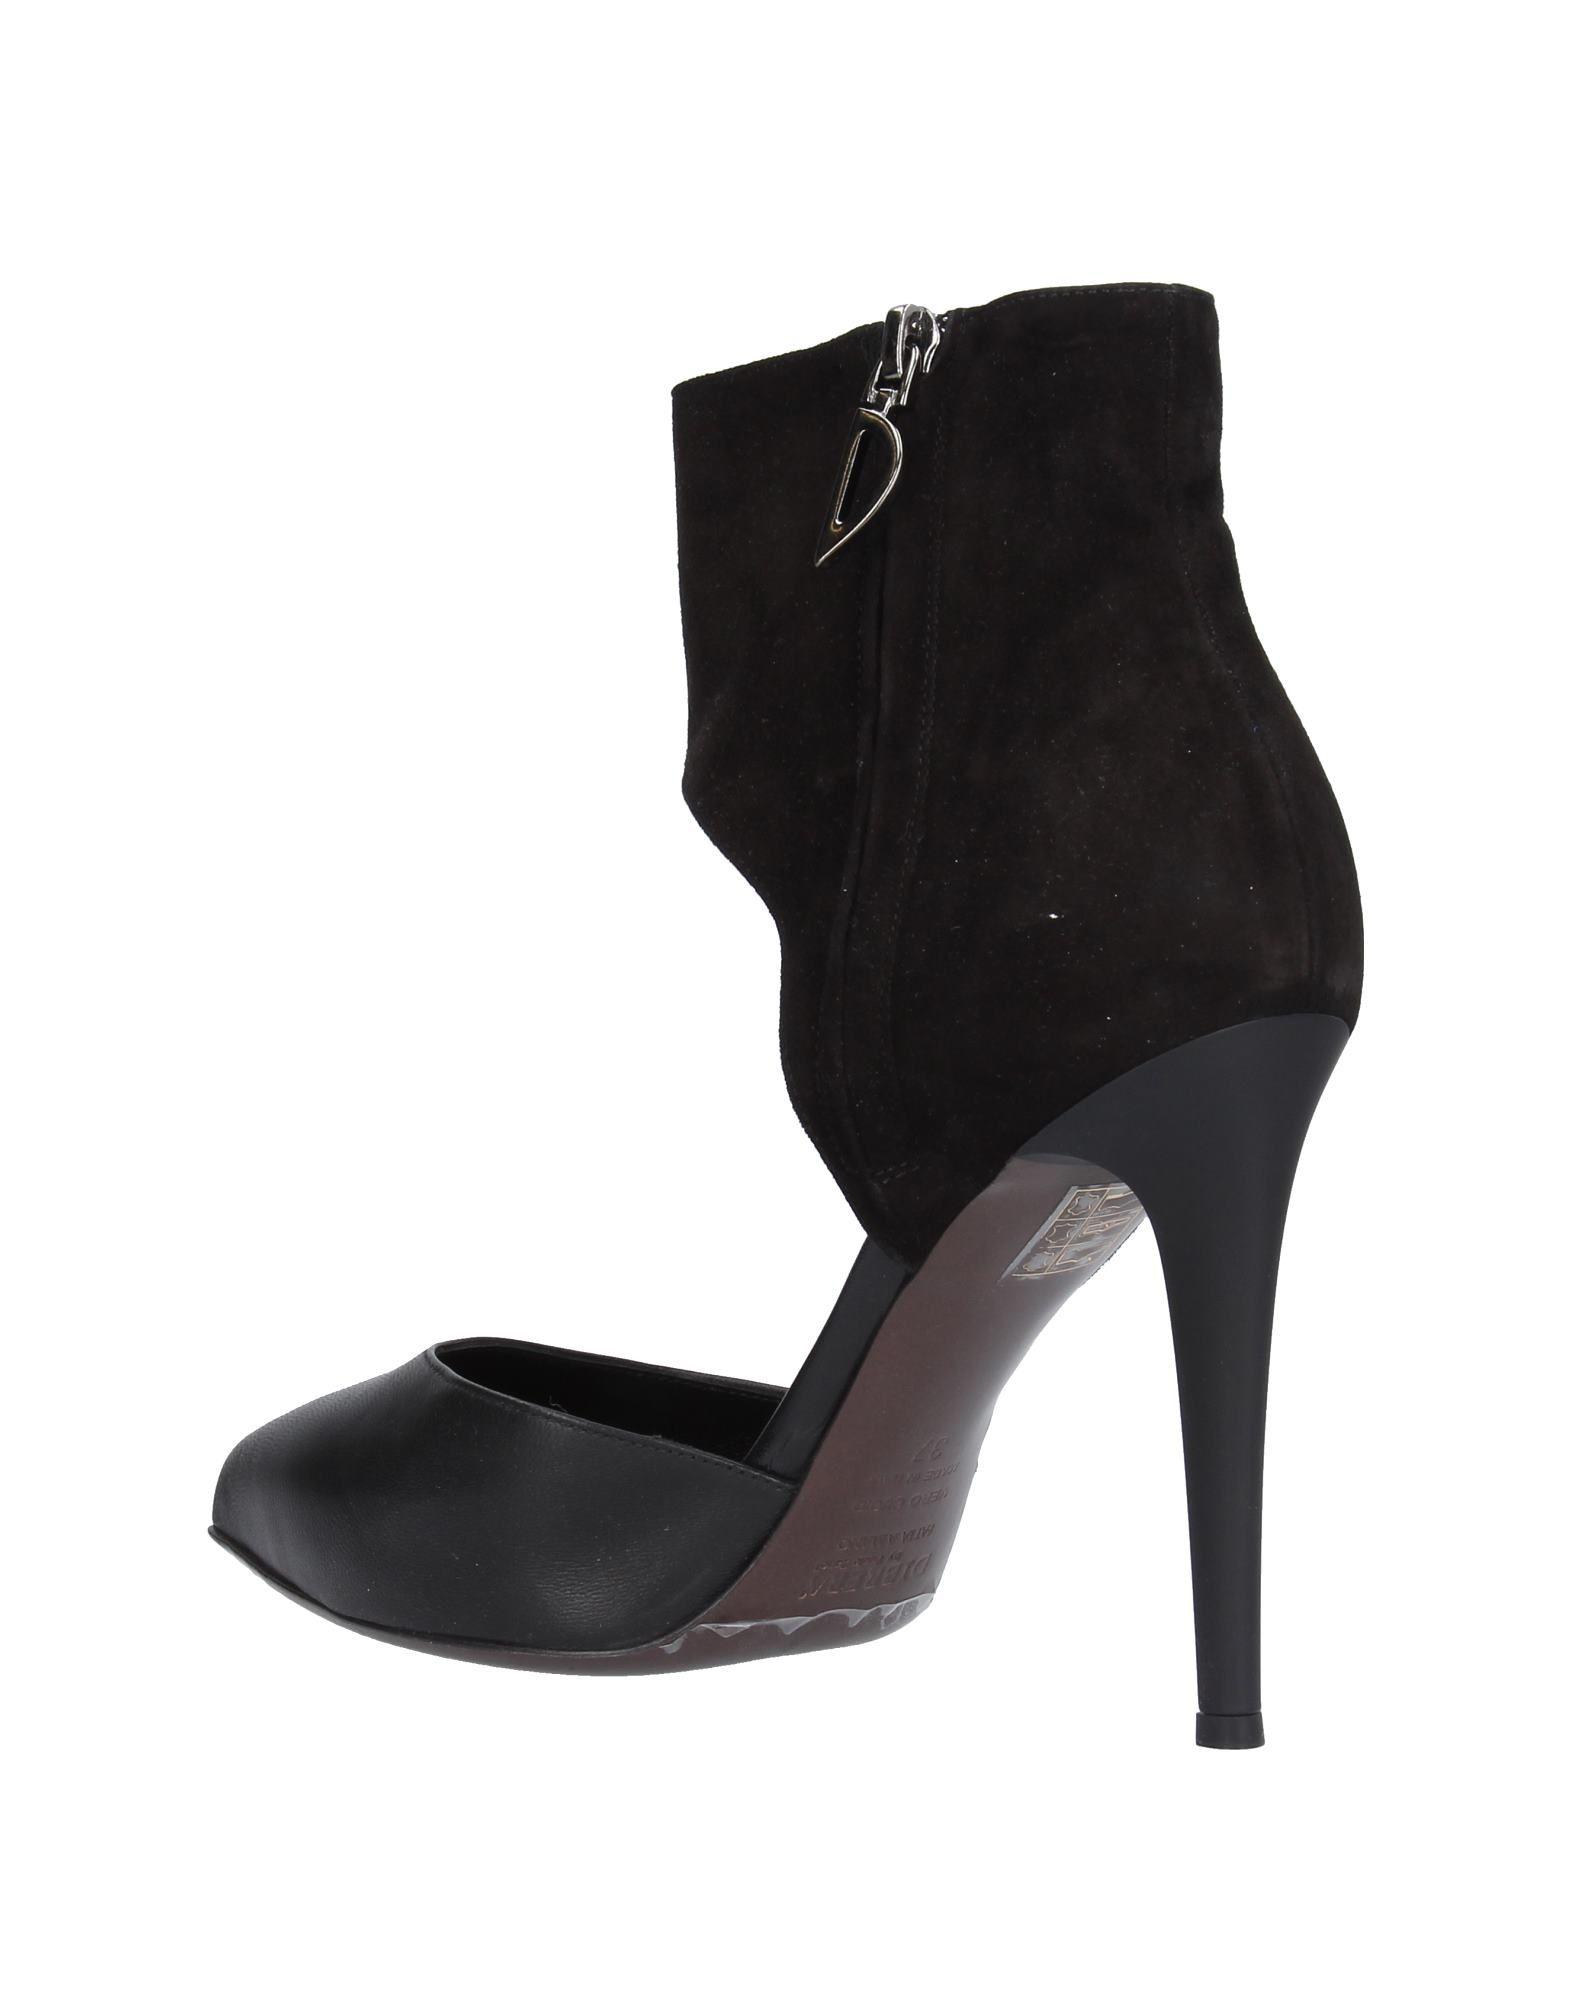 Stilvolle billige Schuhe Damen Dibrera By Paolo Zanoli Pumps Damen Schuhe  11196448QD 225757